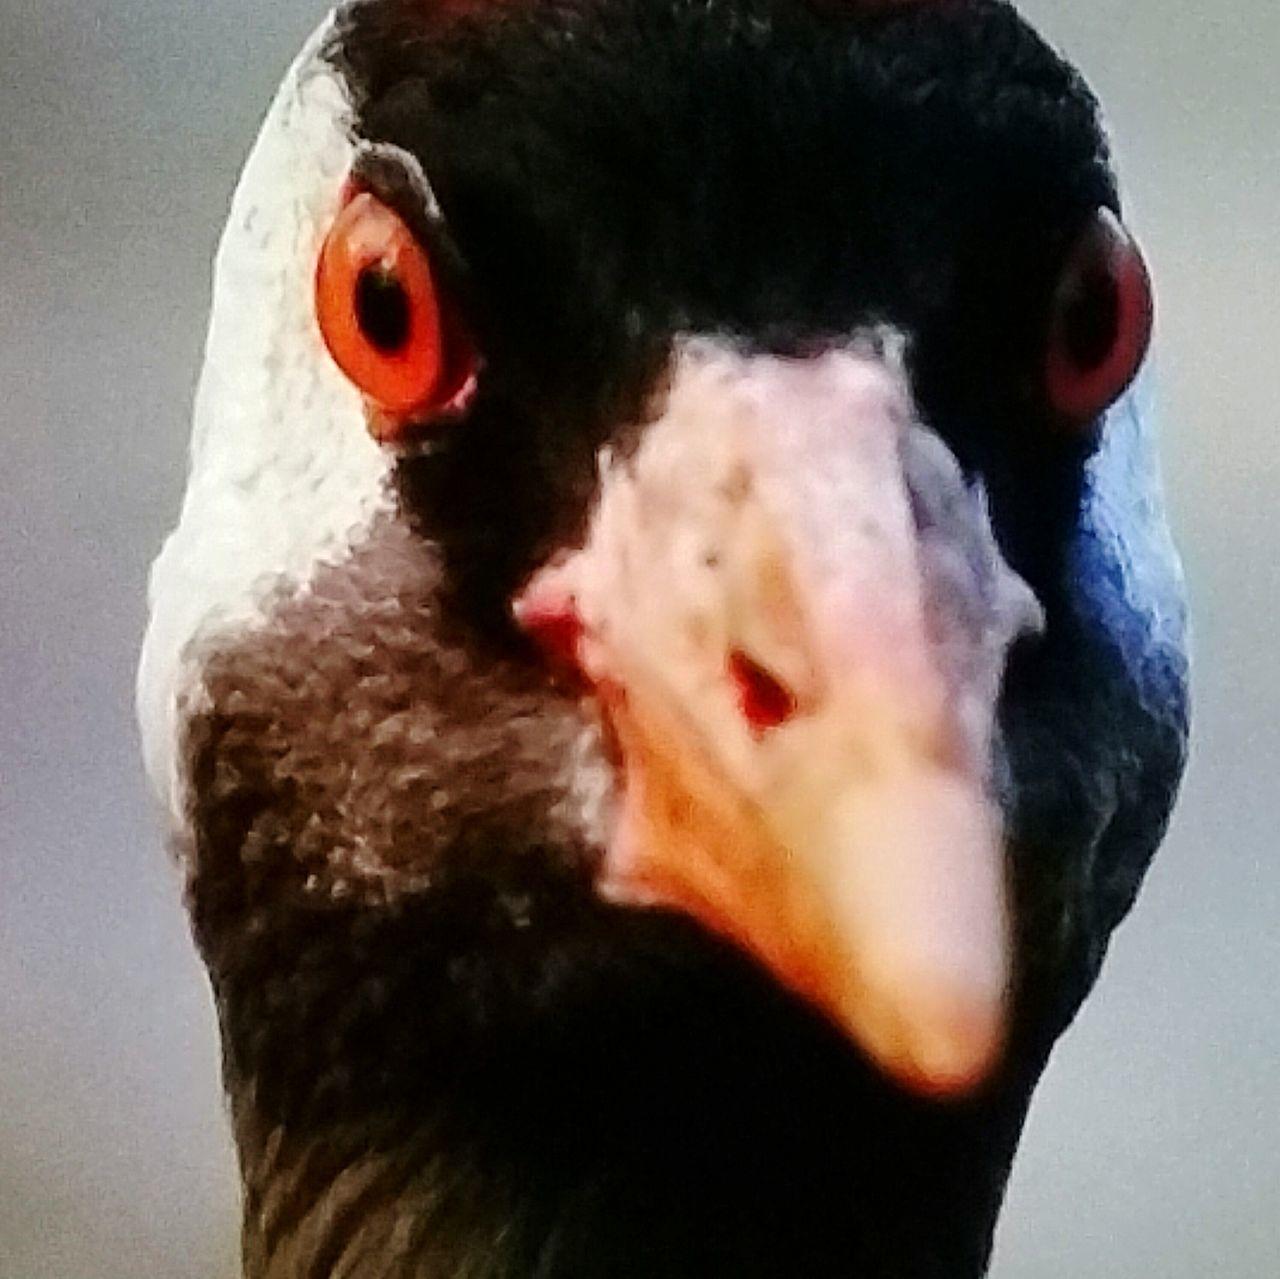 bird, one animal, beak, animal themes, animals in the wild, close-up, animal head, animal wildlife, no people, looking at camera, nature, day, portrait, outdoors, bird of prey